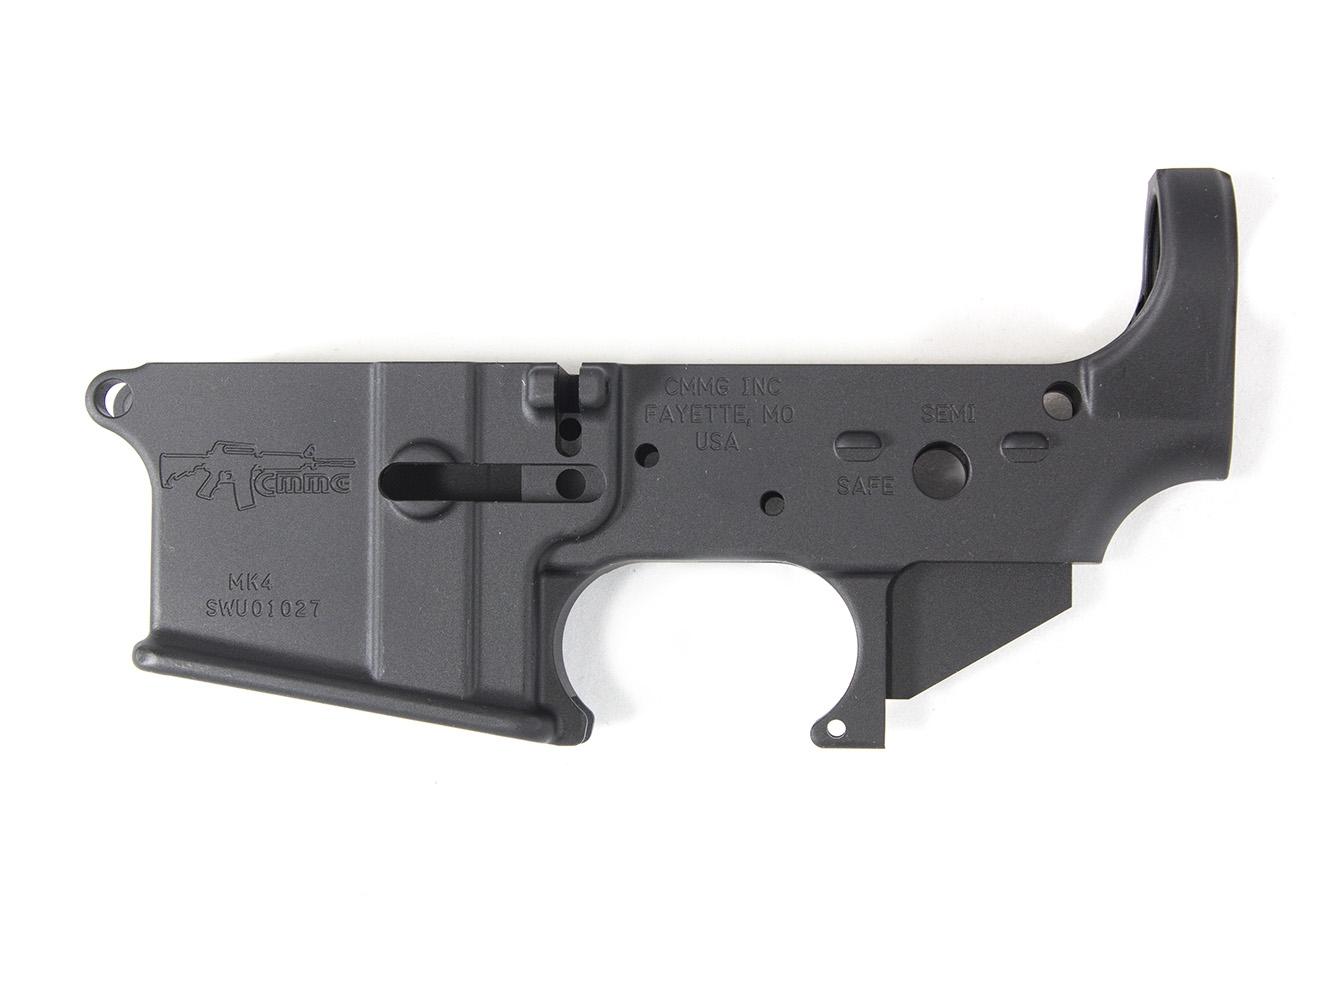 CMMG CMMG Lower Receiver, AR-15